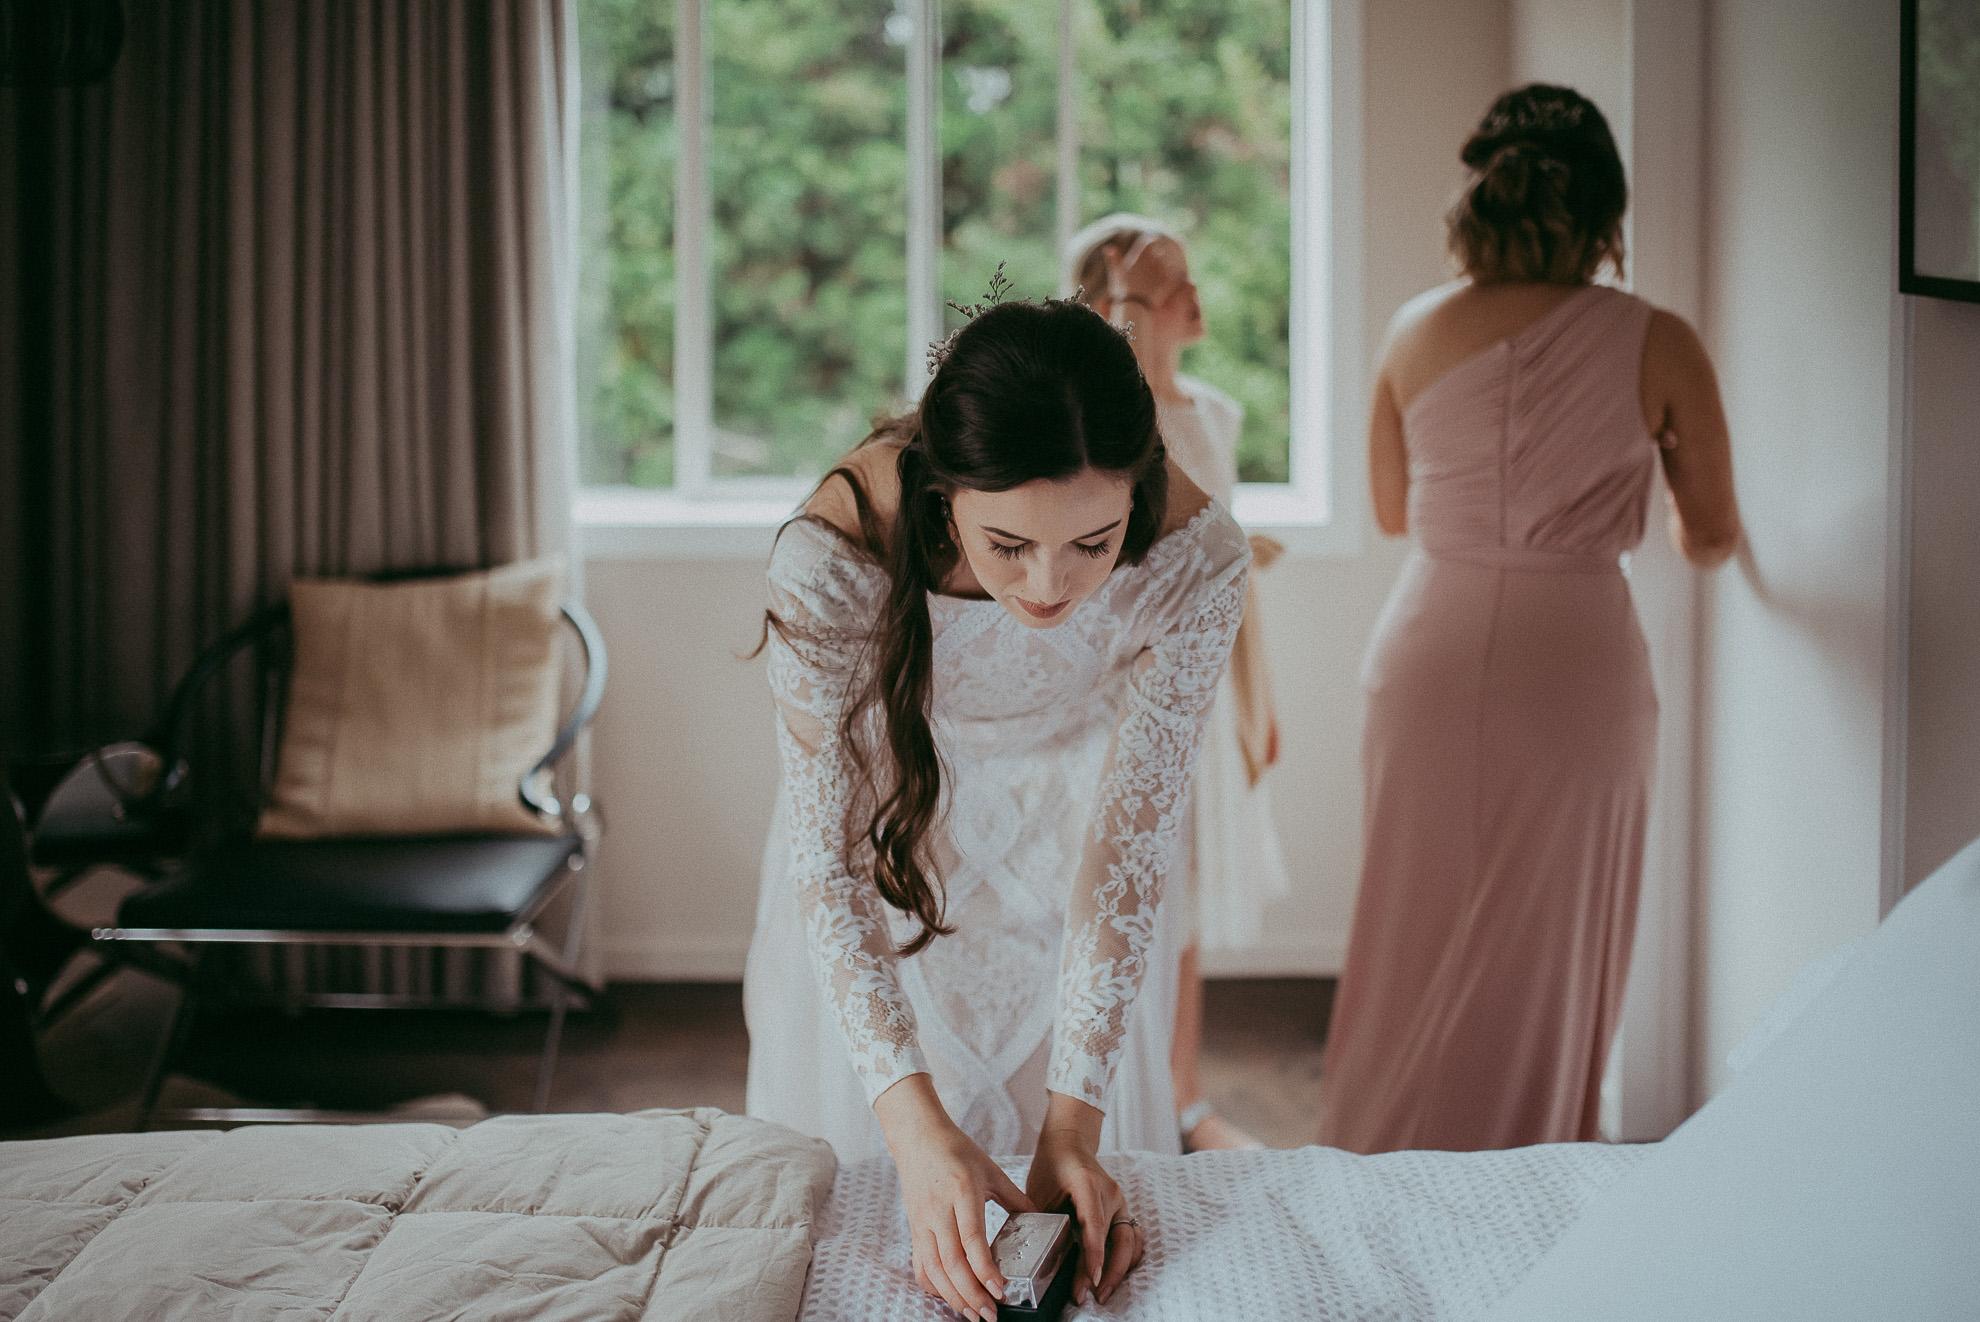 Kumeu wedding - HU's Art Farm {Weddings photographers in West Auckland, New Zealand}